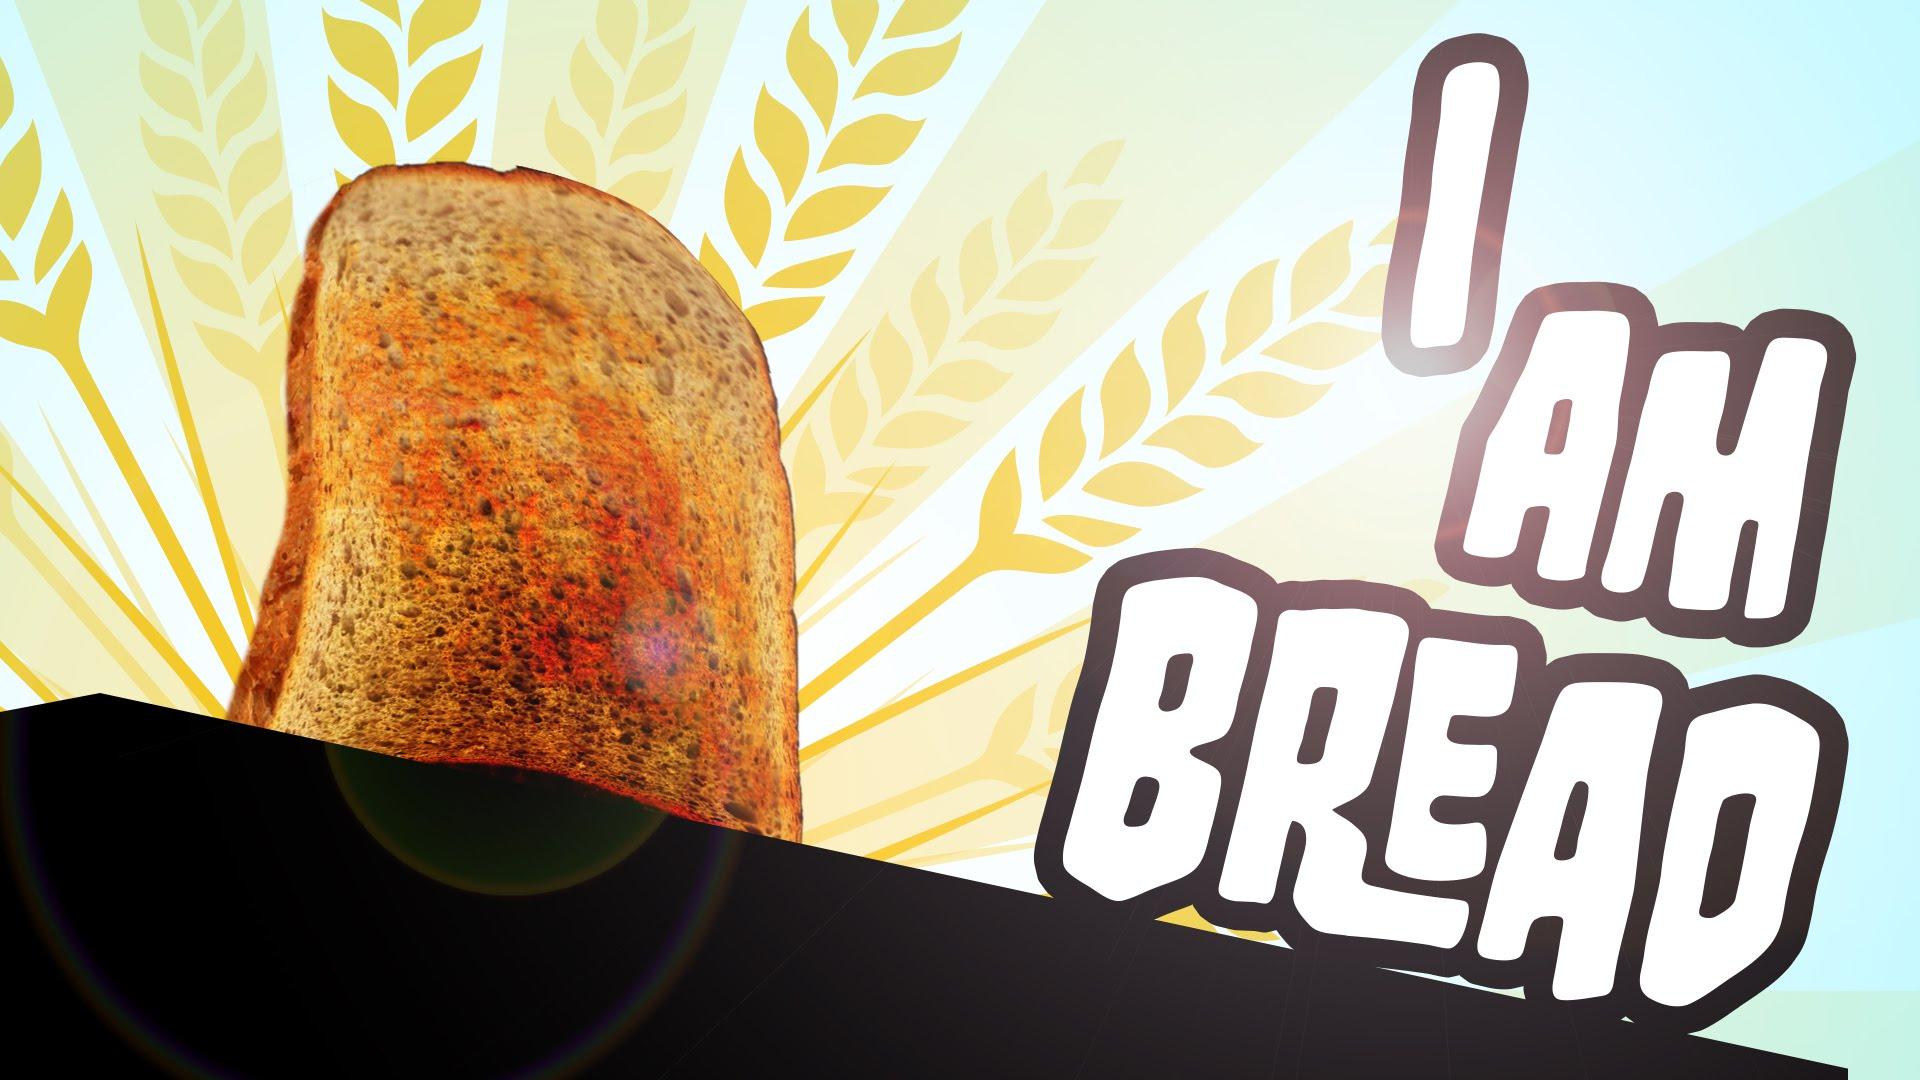 I Am Bread Backgrounds, Compatible - PC, Mobile, Gadgets| 1920x1080 px